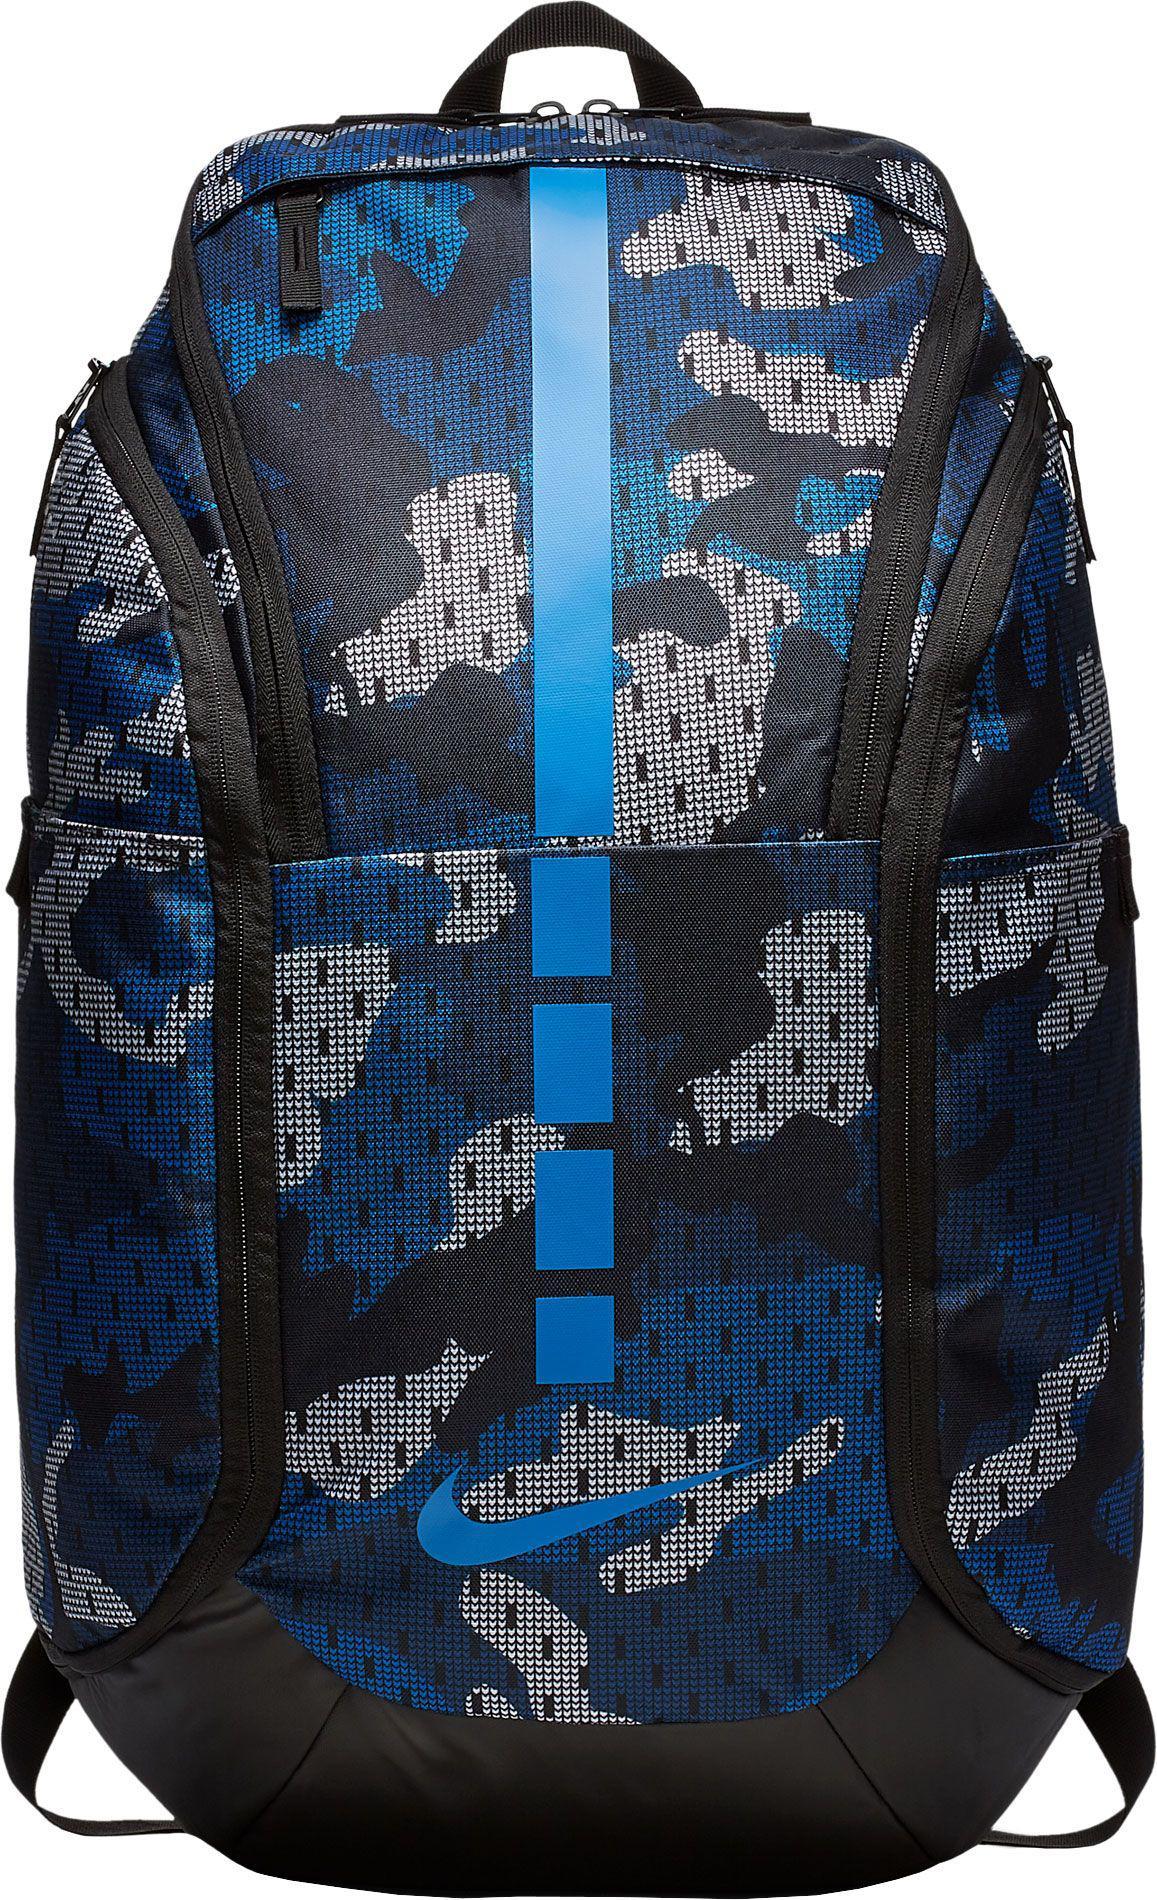 7e64b709b129 Mens Blue Hoops Elite Pro Camo Basketball Backpack new product 181ba 5d0f5  ...